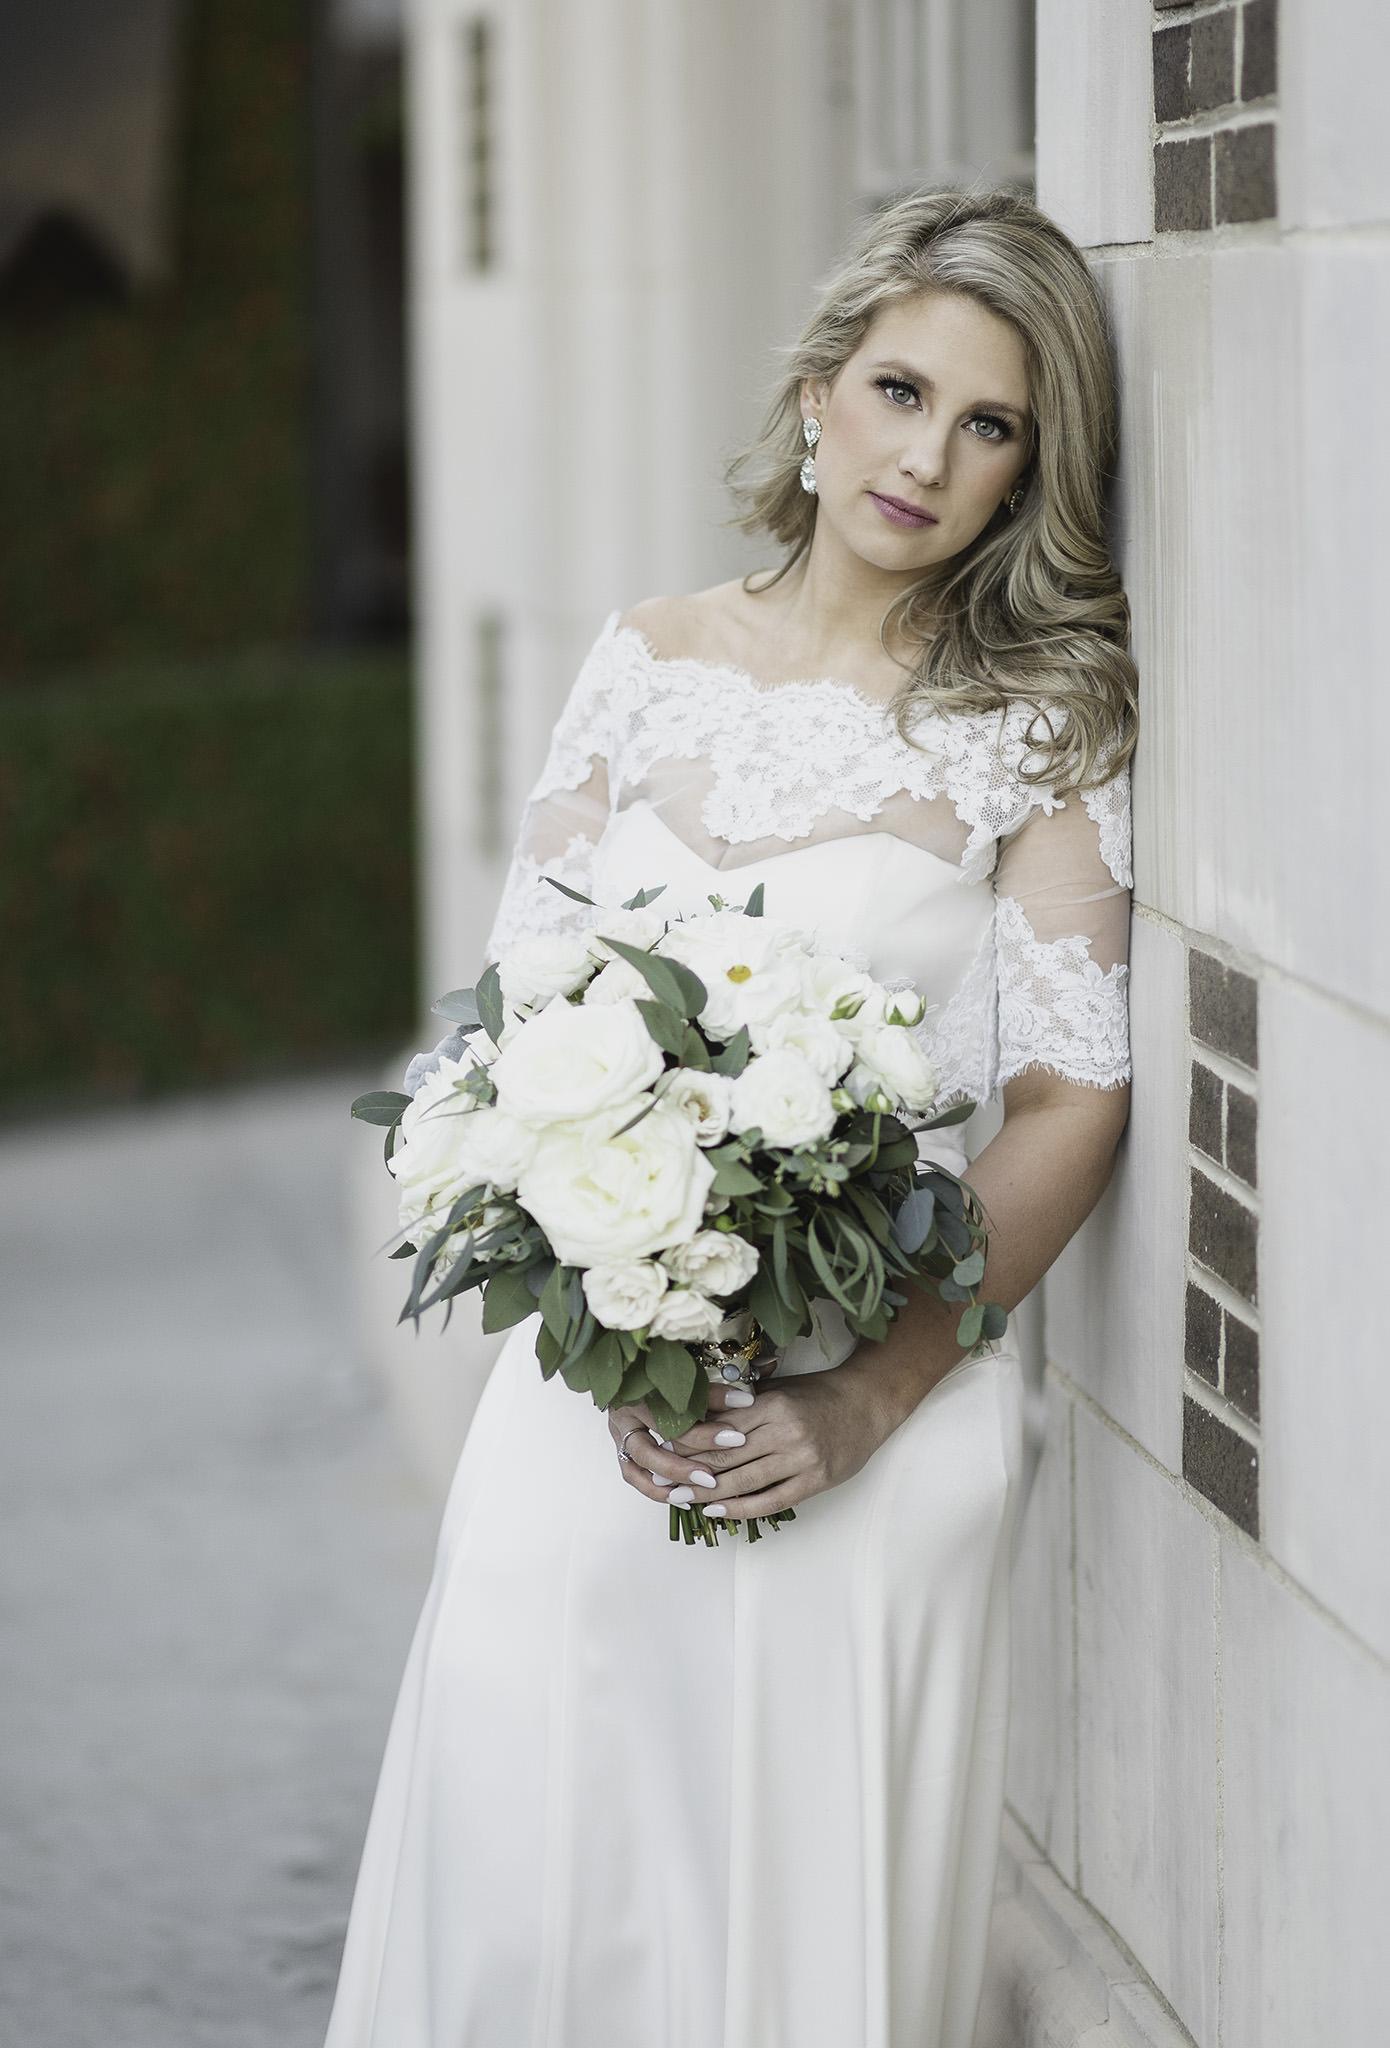 Claire-Travis-Classy-artistic-Downtown-Houston-Rice-ballroom-wedding-sm-019.jpg